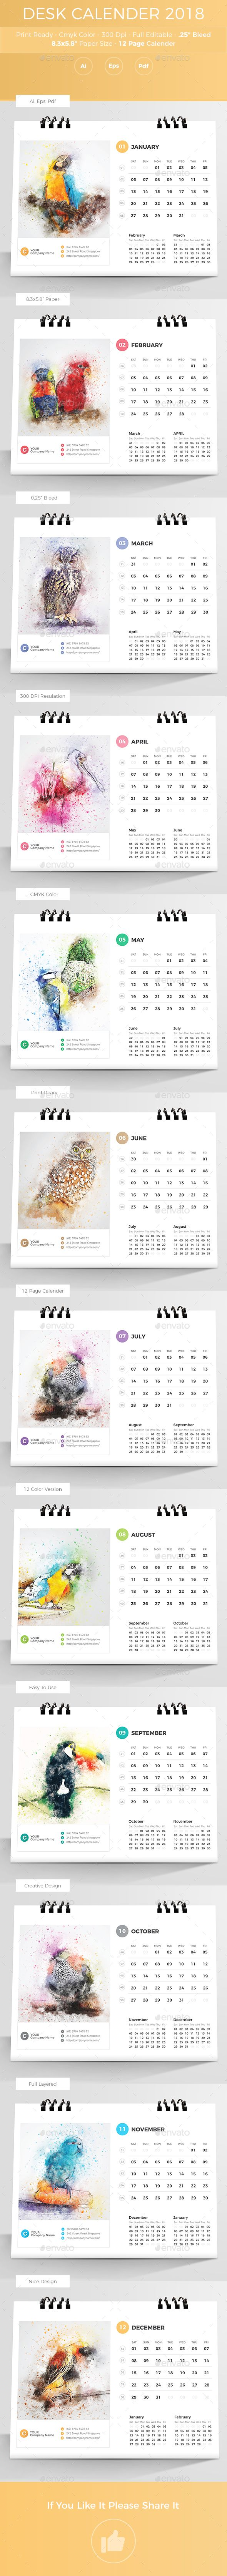 Desk Calender 2018 | Ai illustrator, Desks and Template